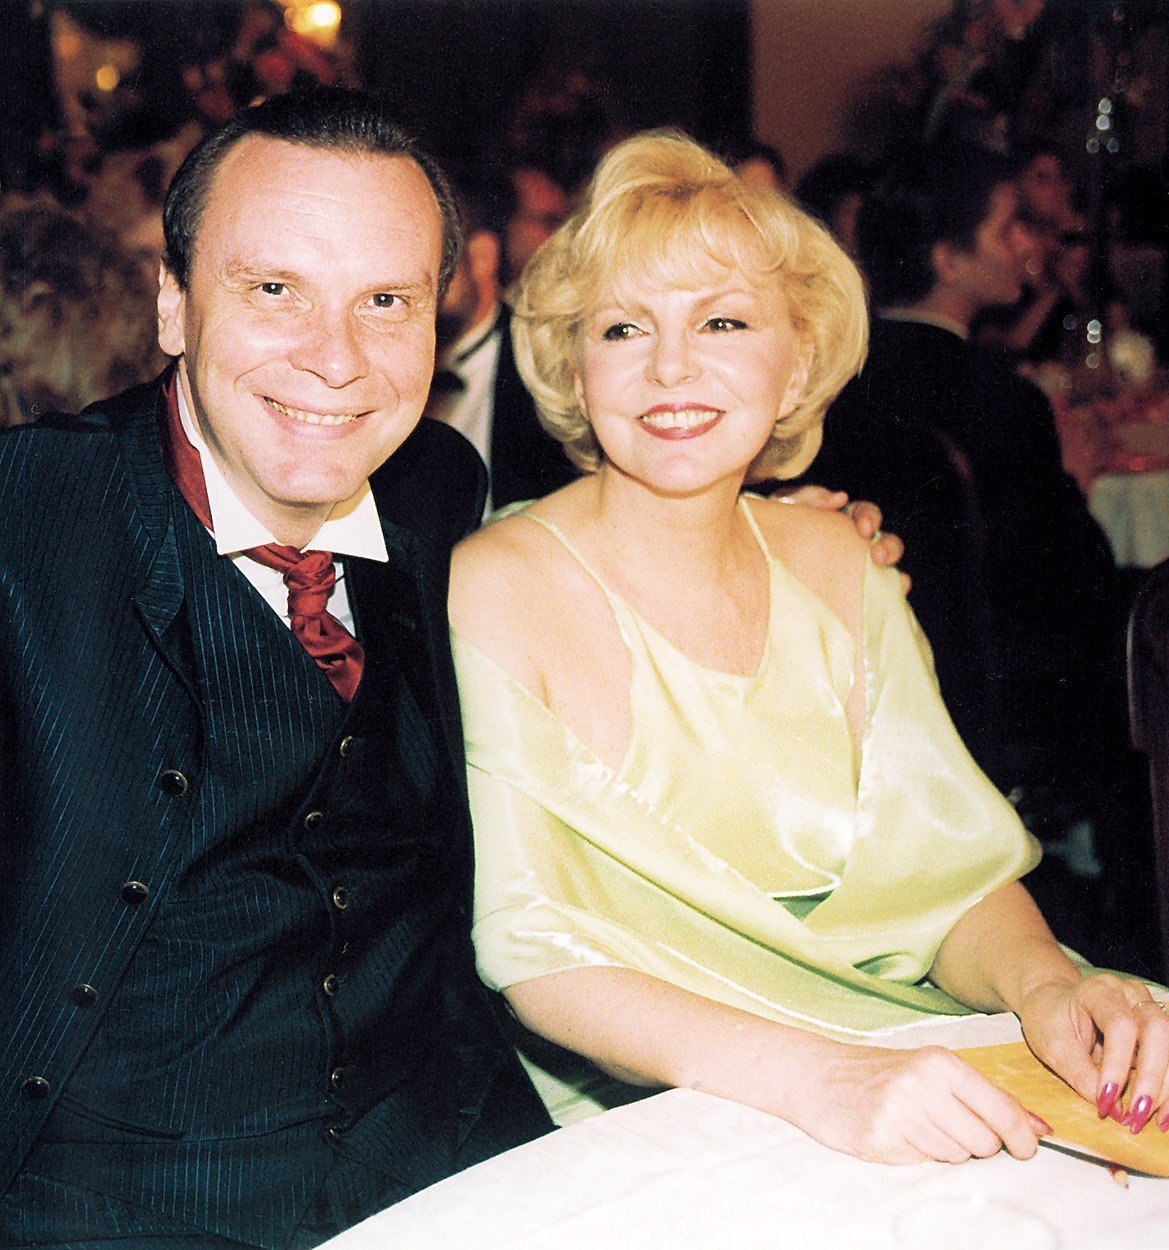 Štefan Margita o stavu své ženy Hany Zagorové: Nikomu bych nepřál, čím teď prochází